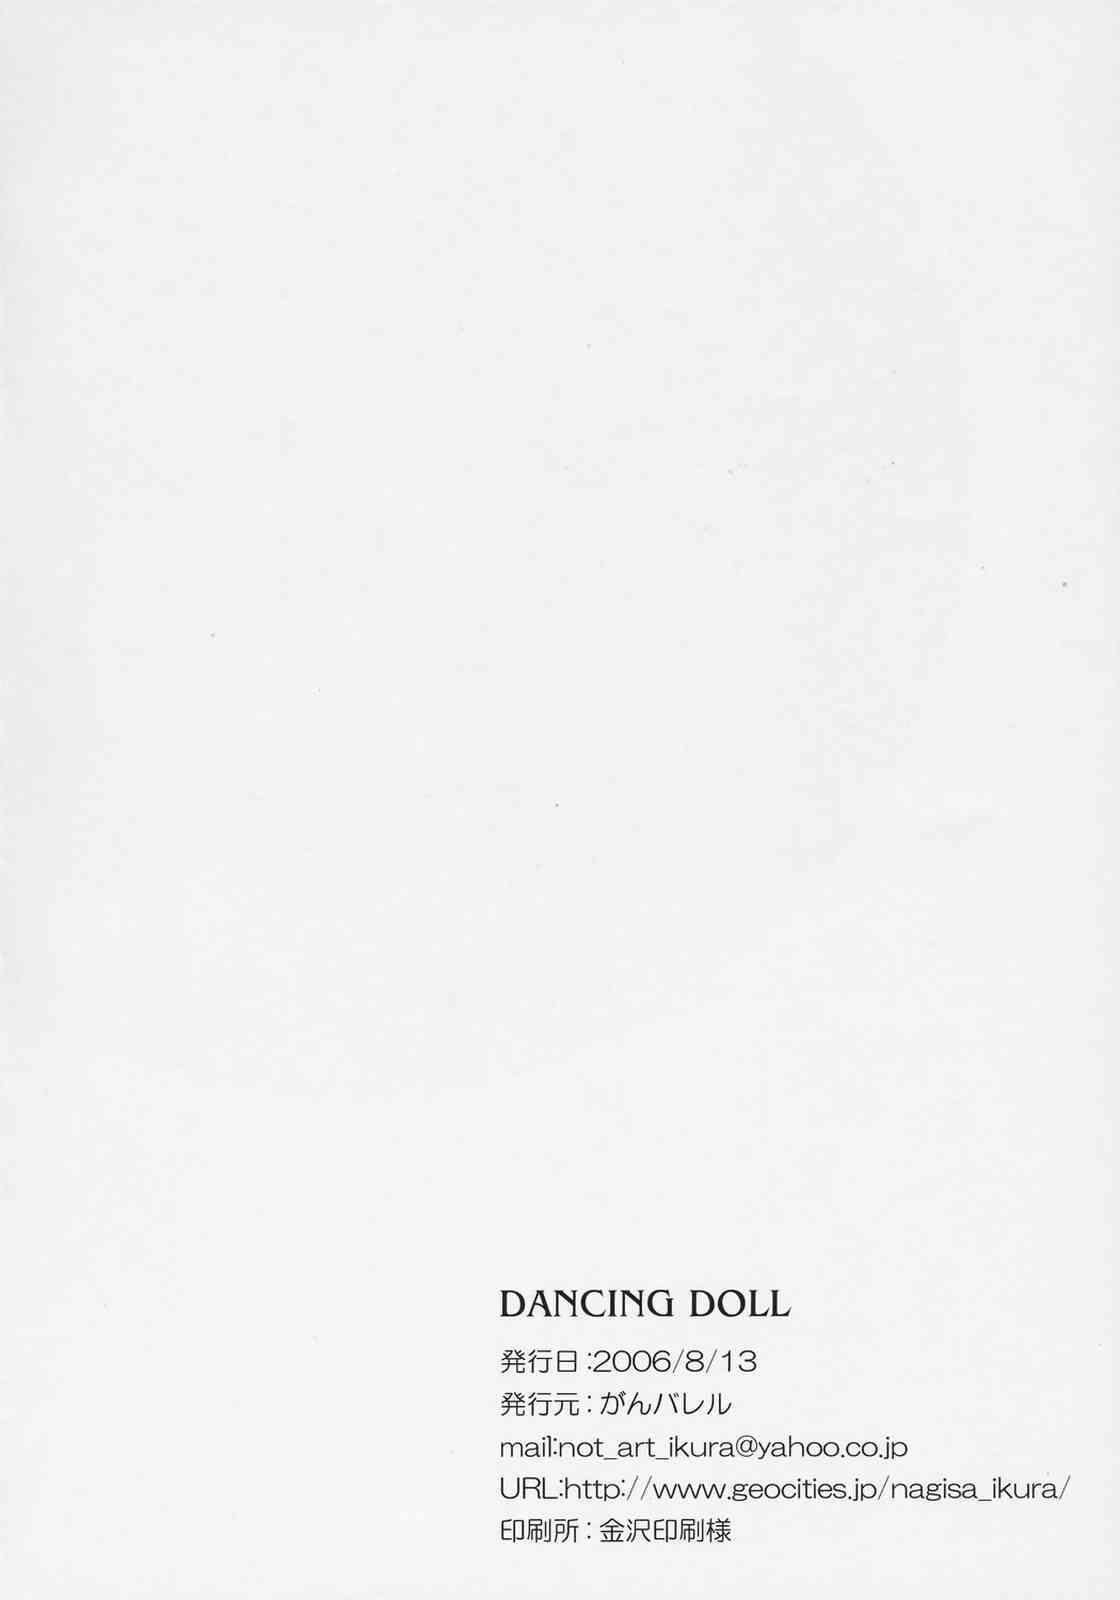 DANCING DOLL 24